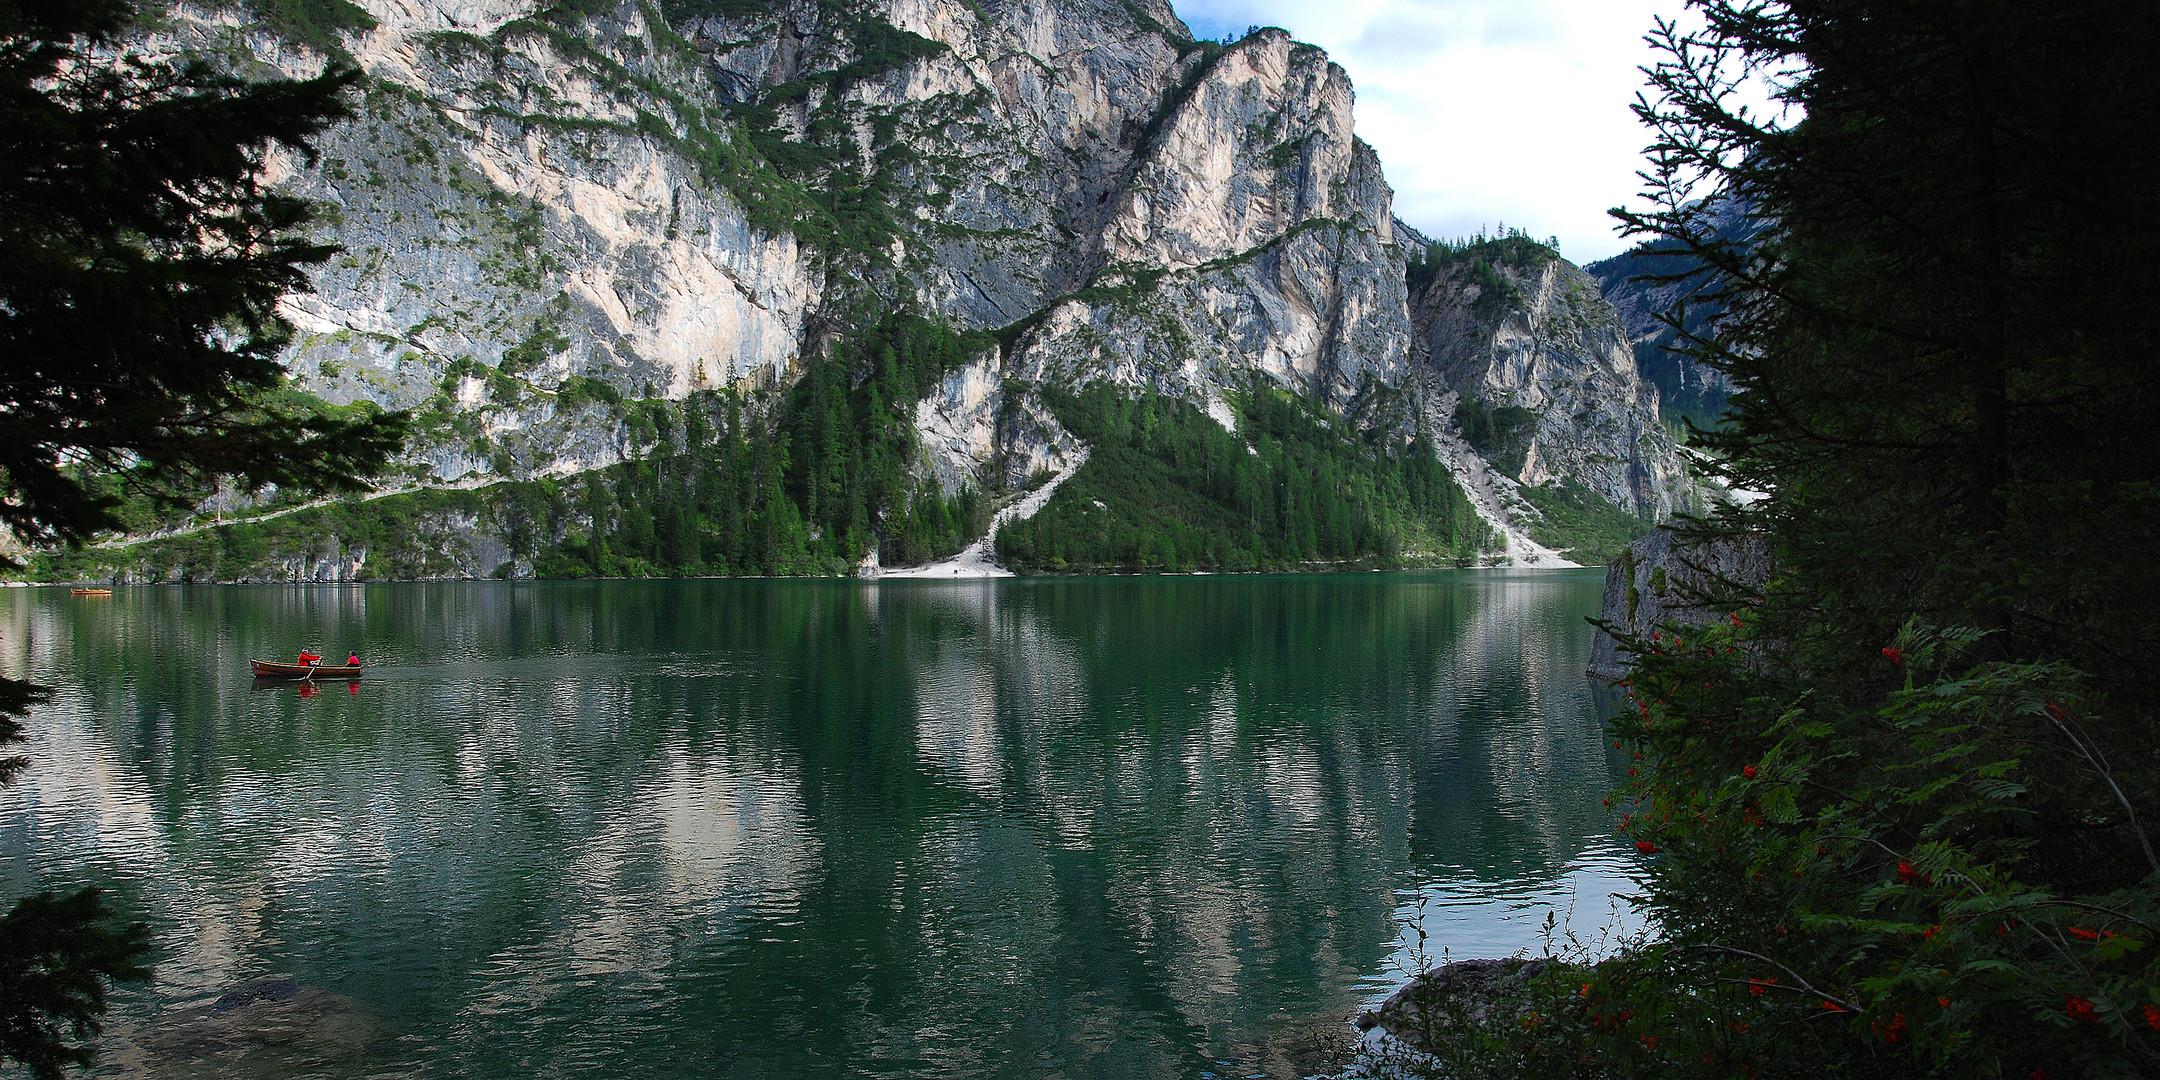 Am Pragser Wildsee I